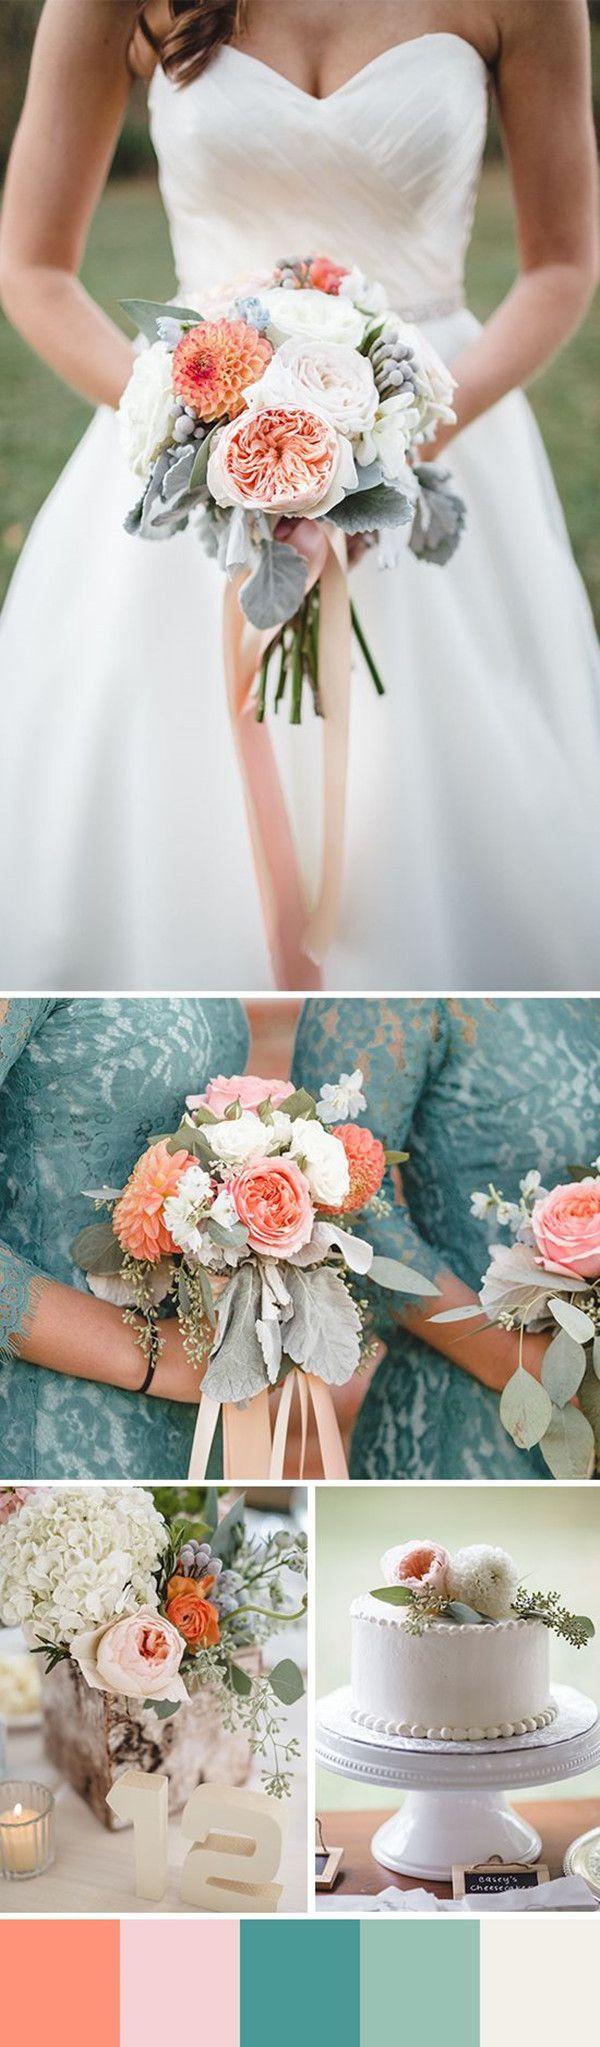 Top 10 Wedding Color Ideas for 2016 Trends Wedding